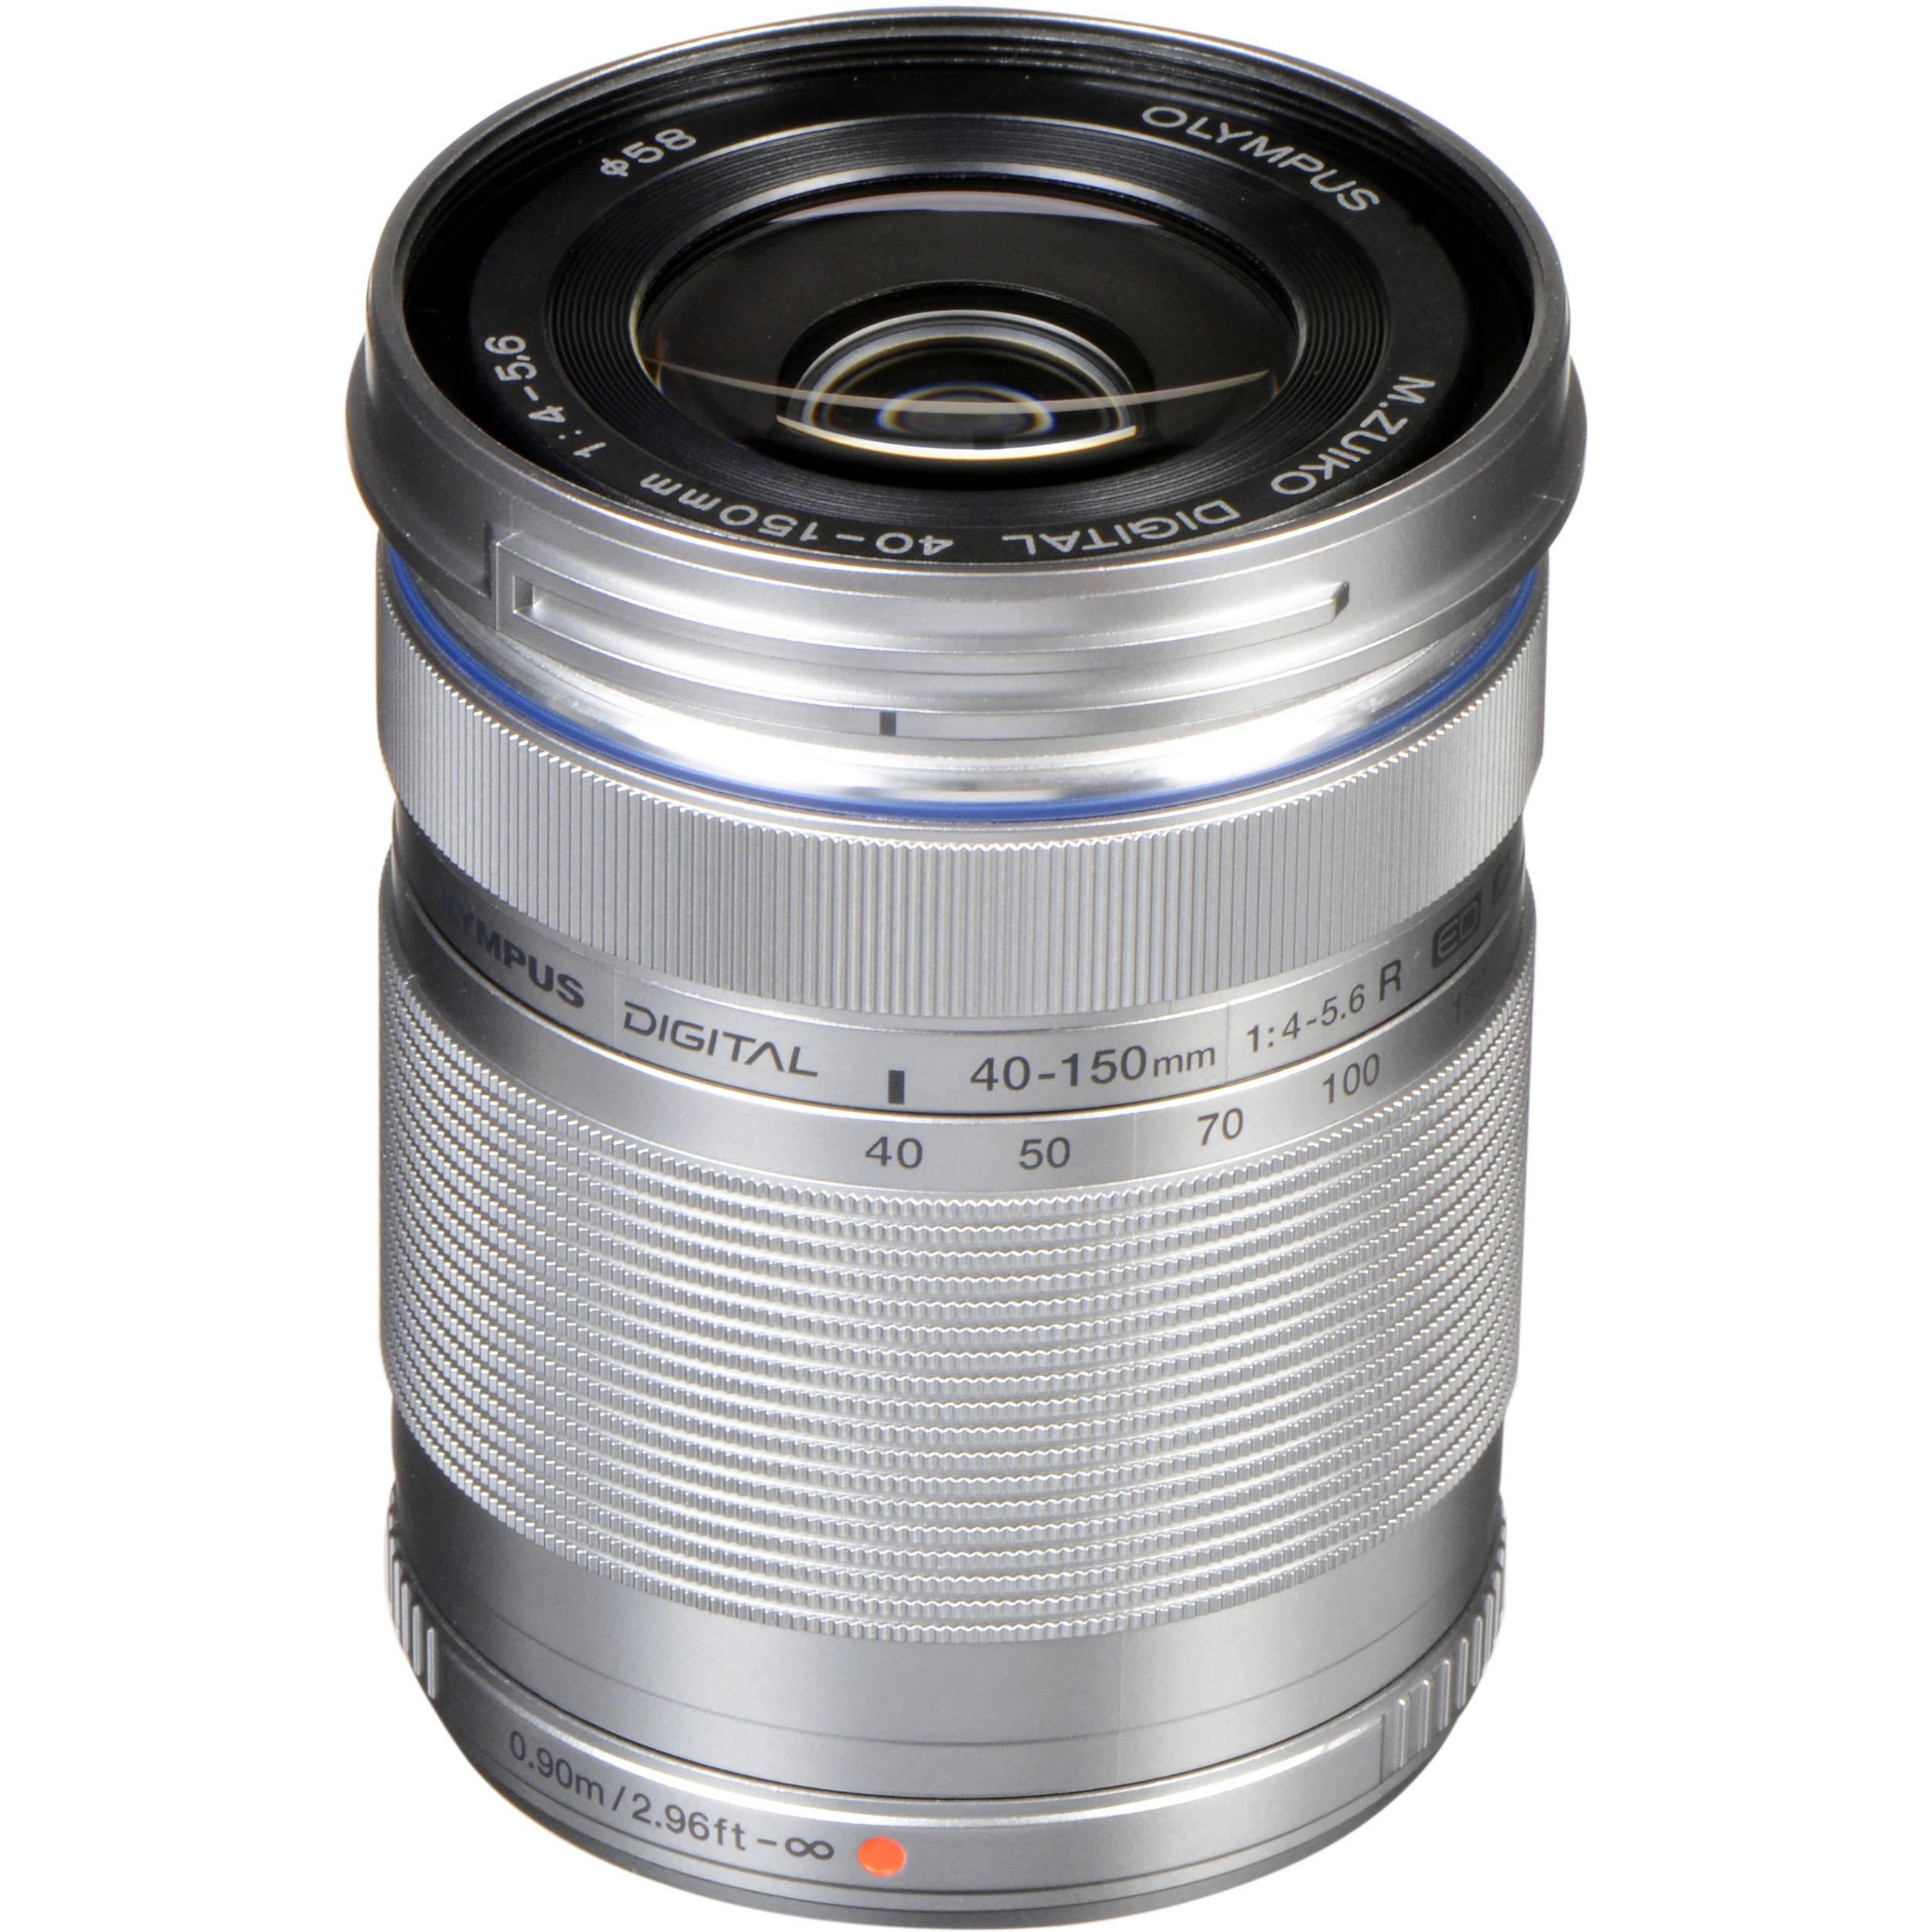 Olympus Mzuiko Digital Ed 40 150mm F 4 56 R Lens V315030su000 Om D E M10 Mark Ii Kit